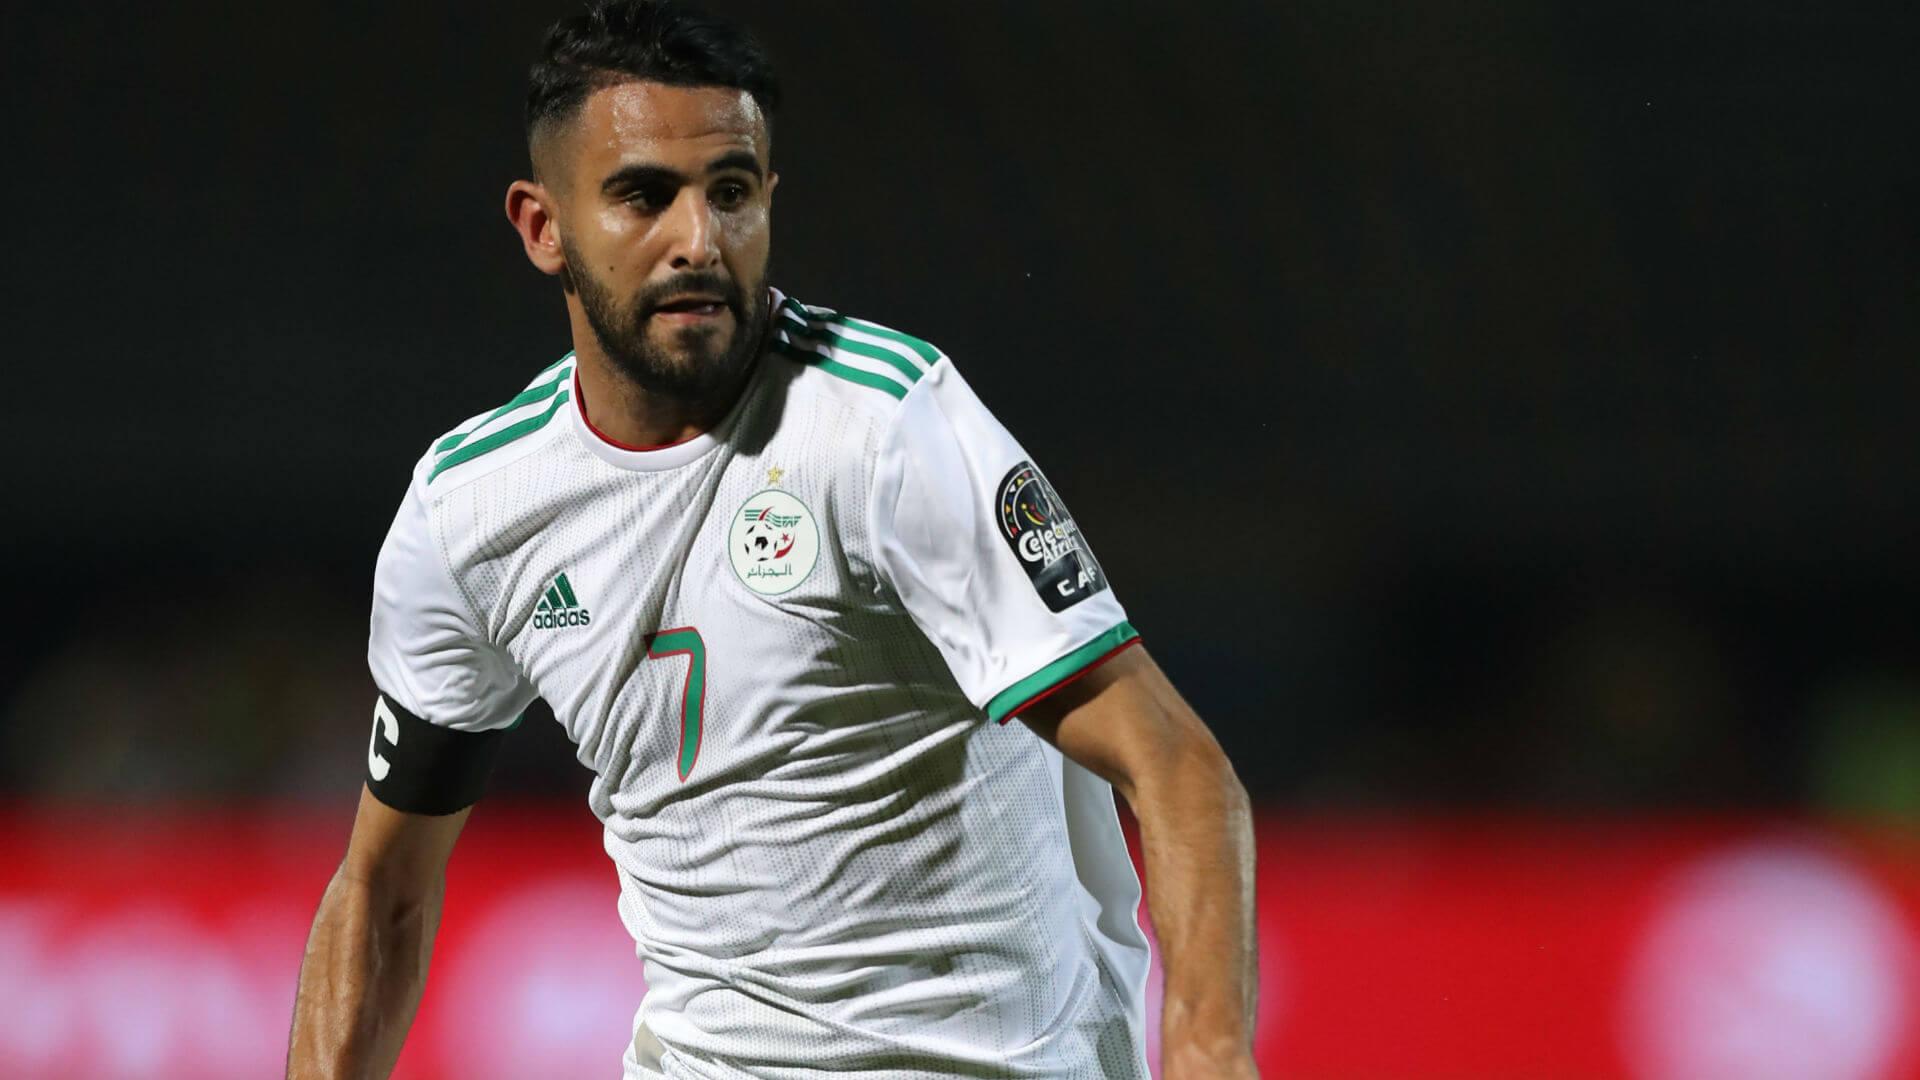 Riyad-Mahrez-breaks-Nigerians-heart-with-last-minute-stunner